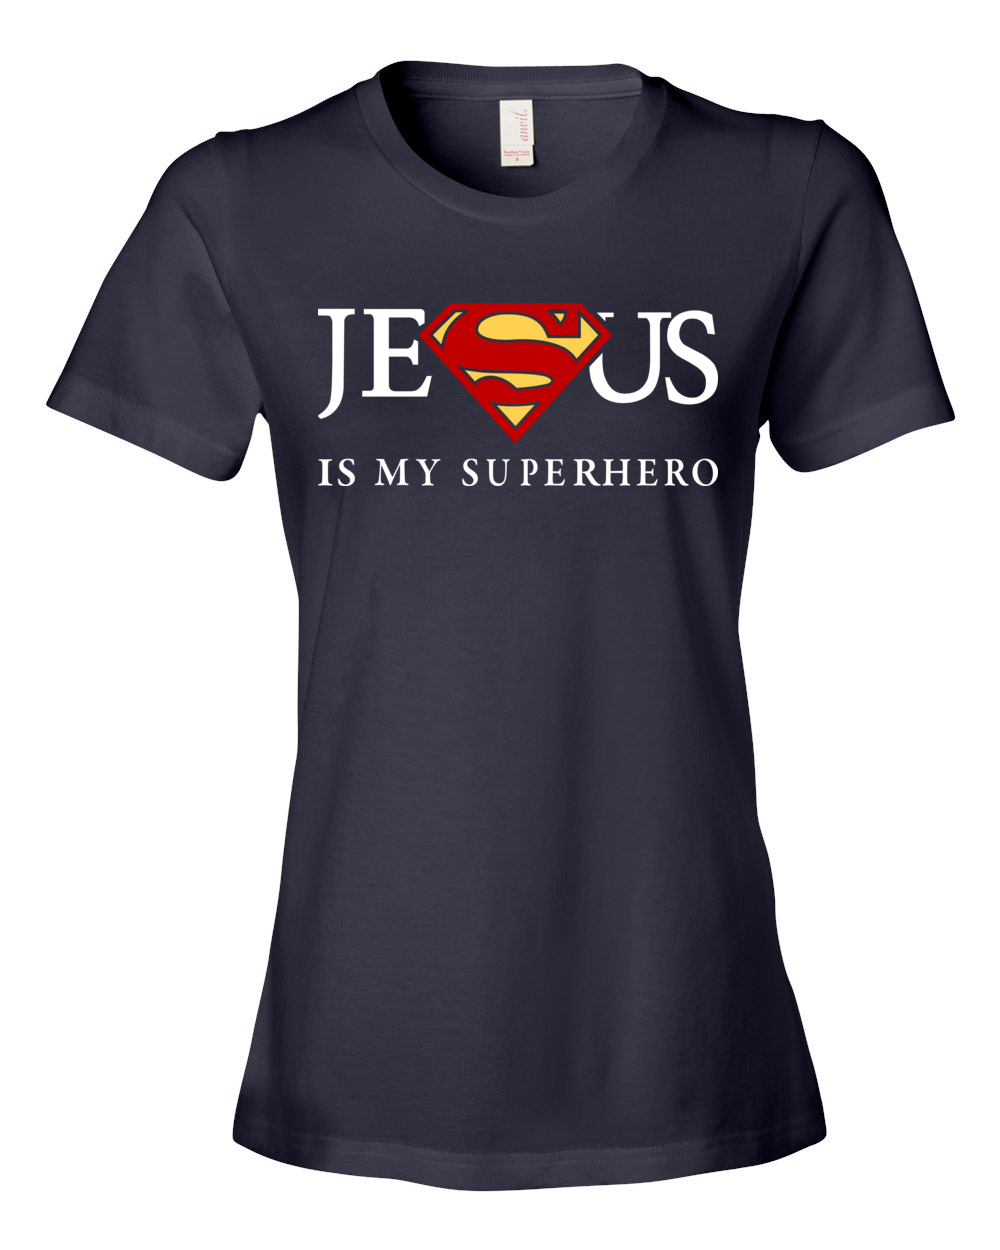 Women s Jesus Is My Superhero Camisetas Superheroes 4181c0a8f41